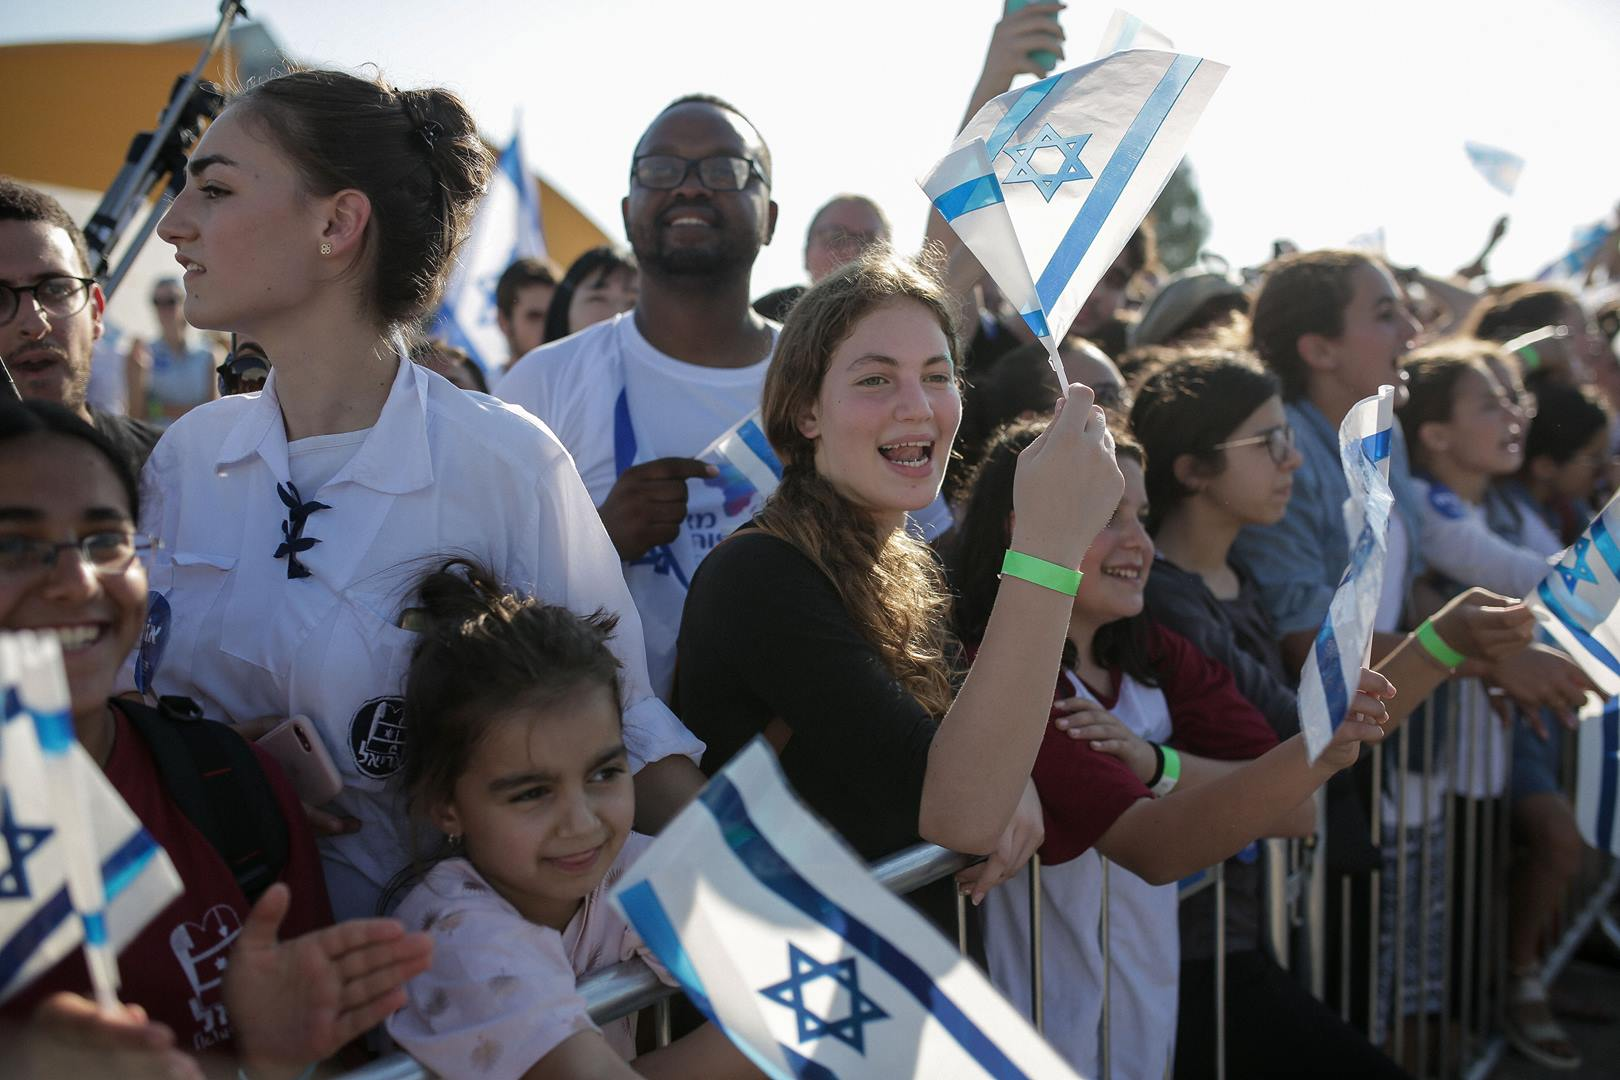 Israel espera receber 250.000 imigrantes judeus após pandemia